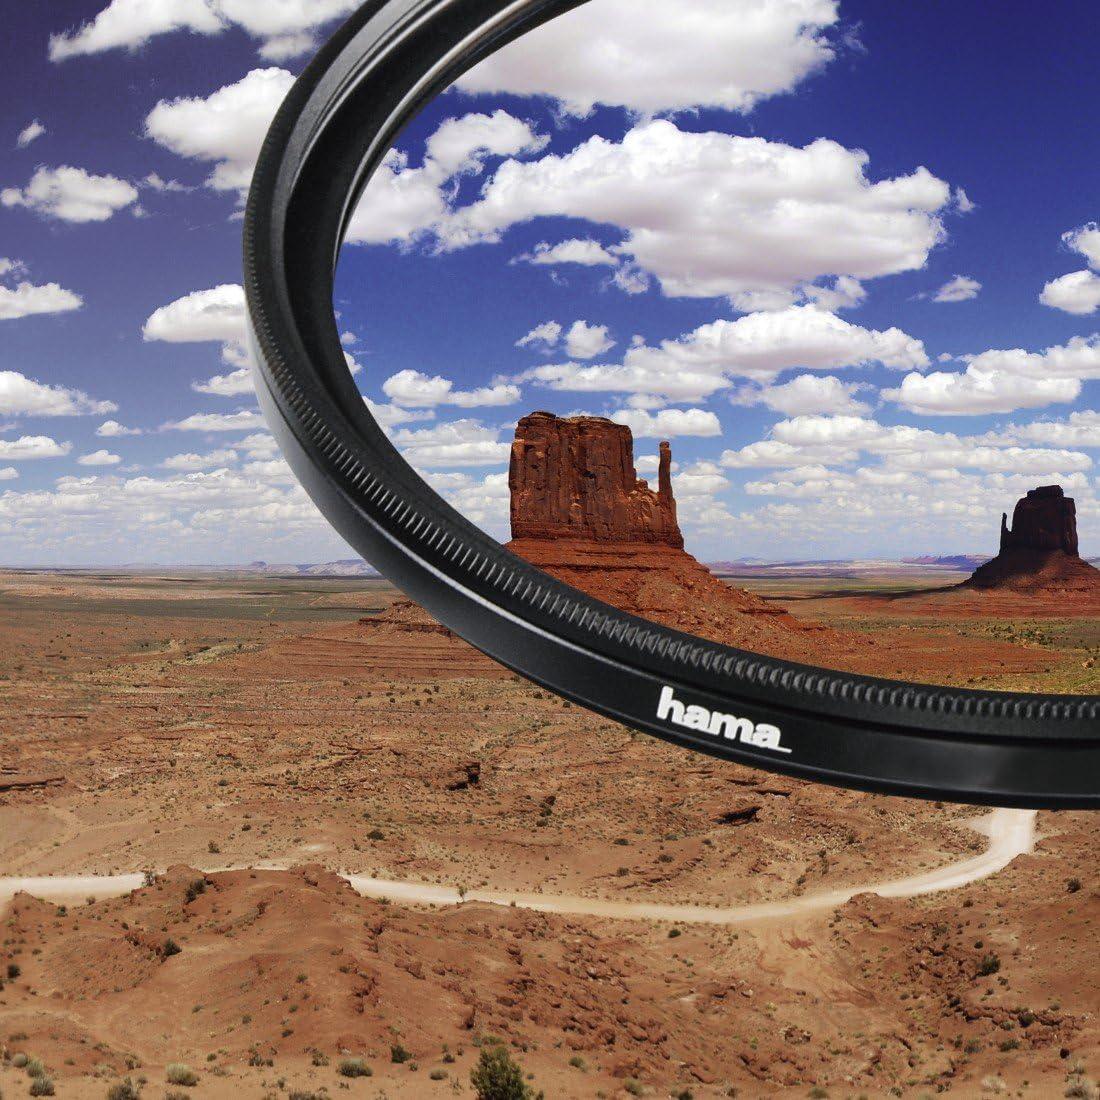 HTMC 8-fach Verg/ütung F/ür 40,5 mm Foto-Kameraobjektive Hama Polarisations-Filter Weitwinkel